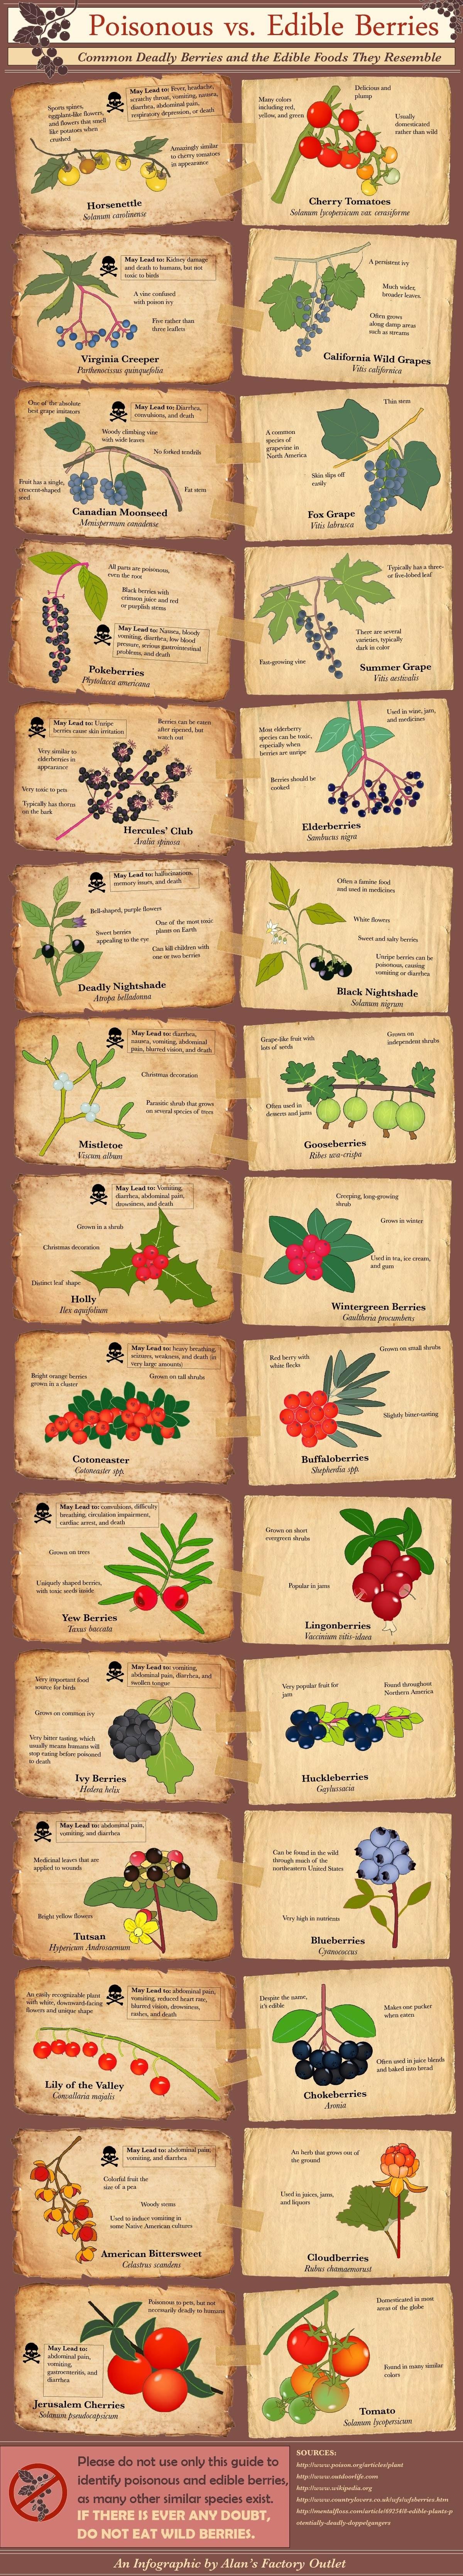 Poisonous vs Edible Berries